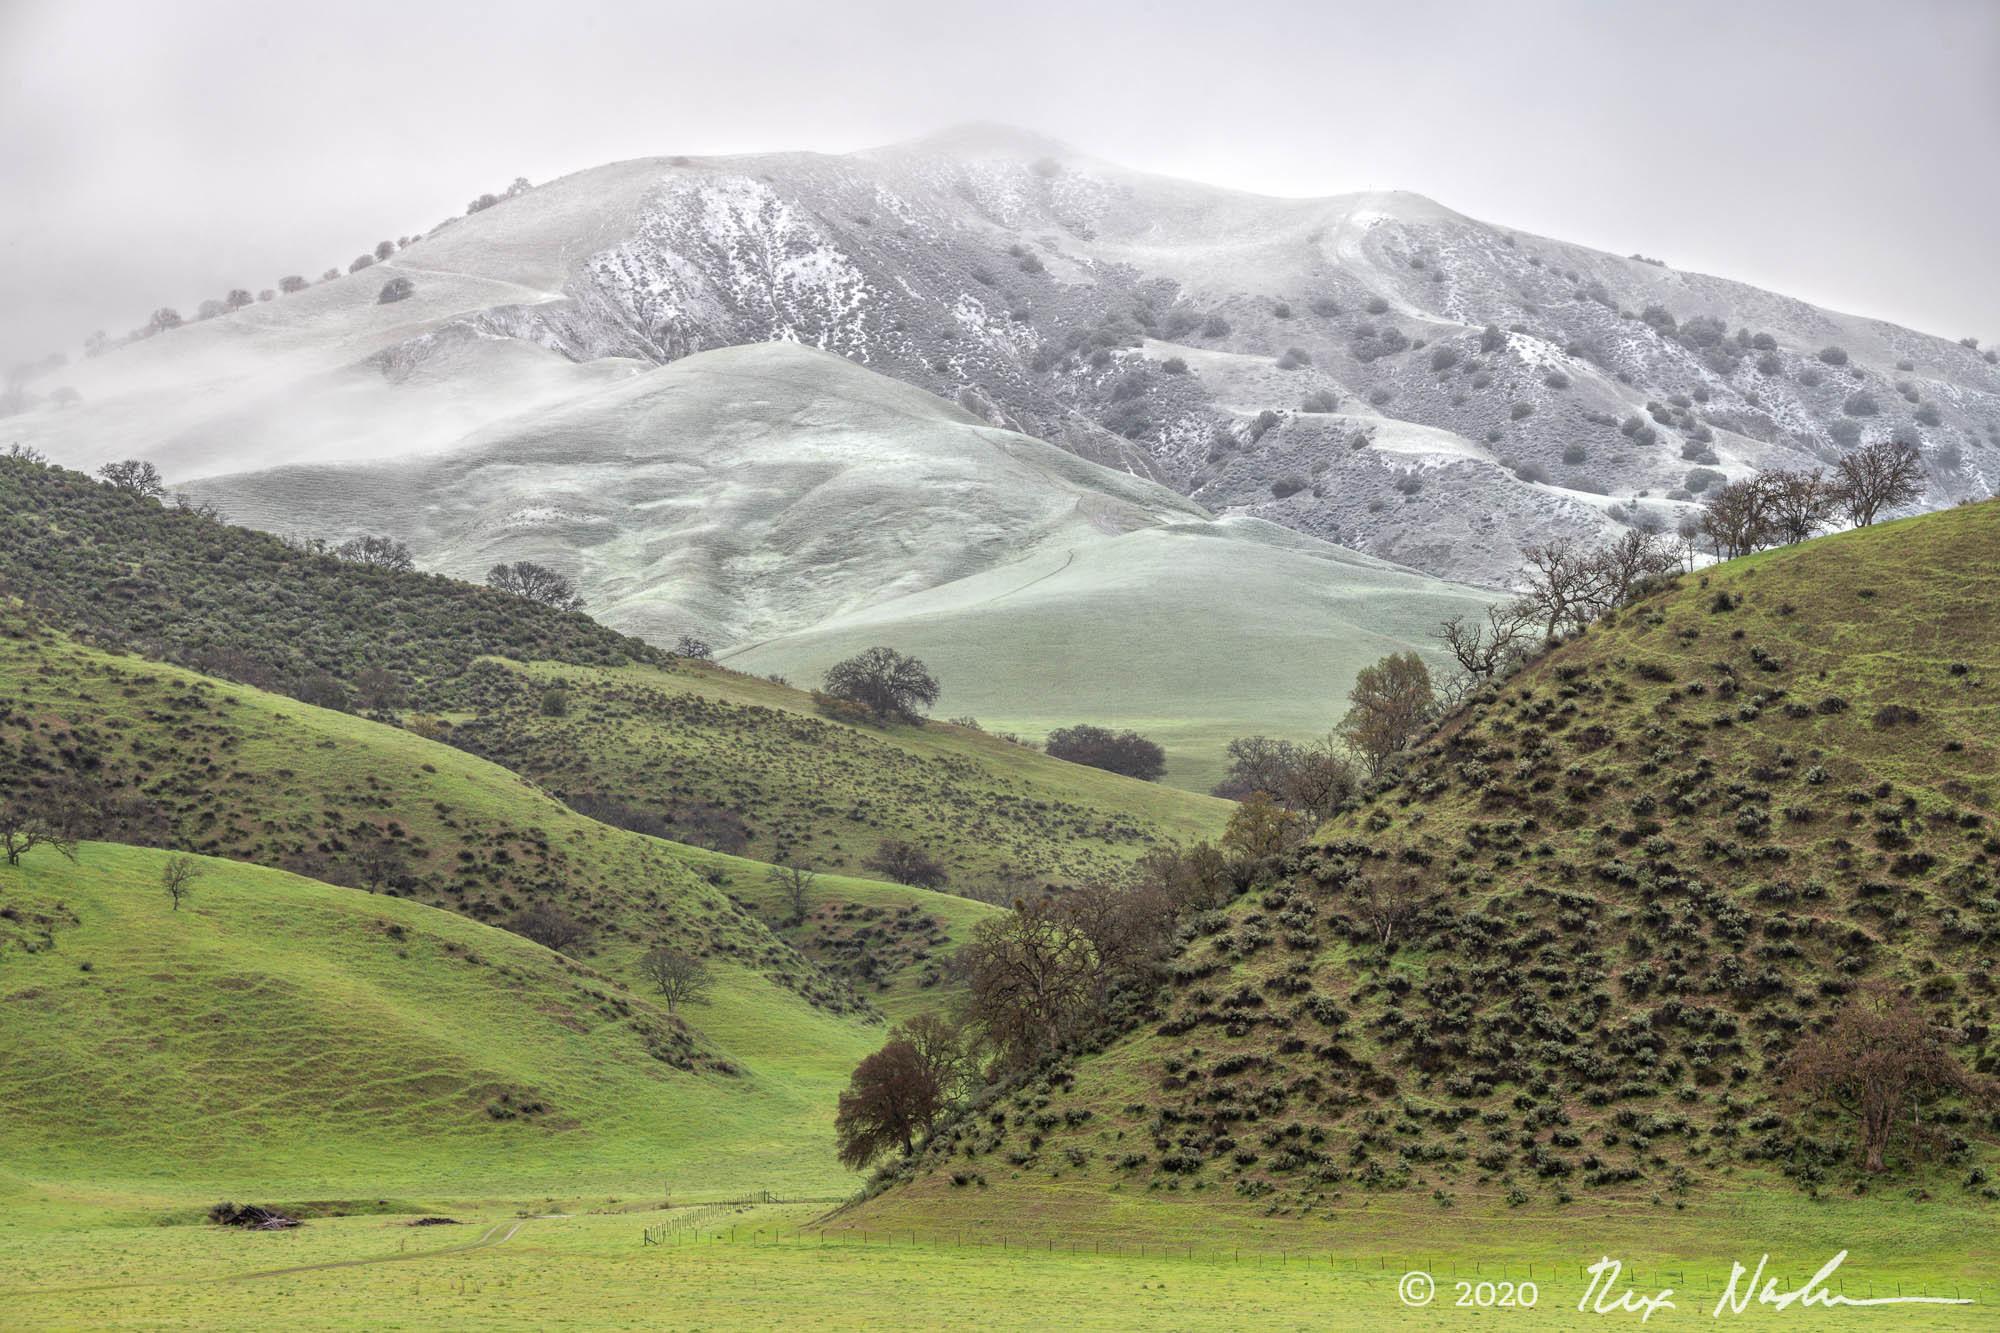 High Range - San Benito County